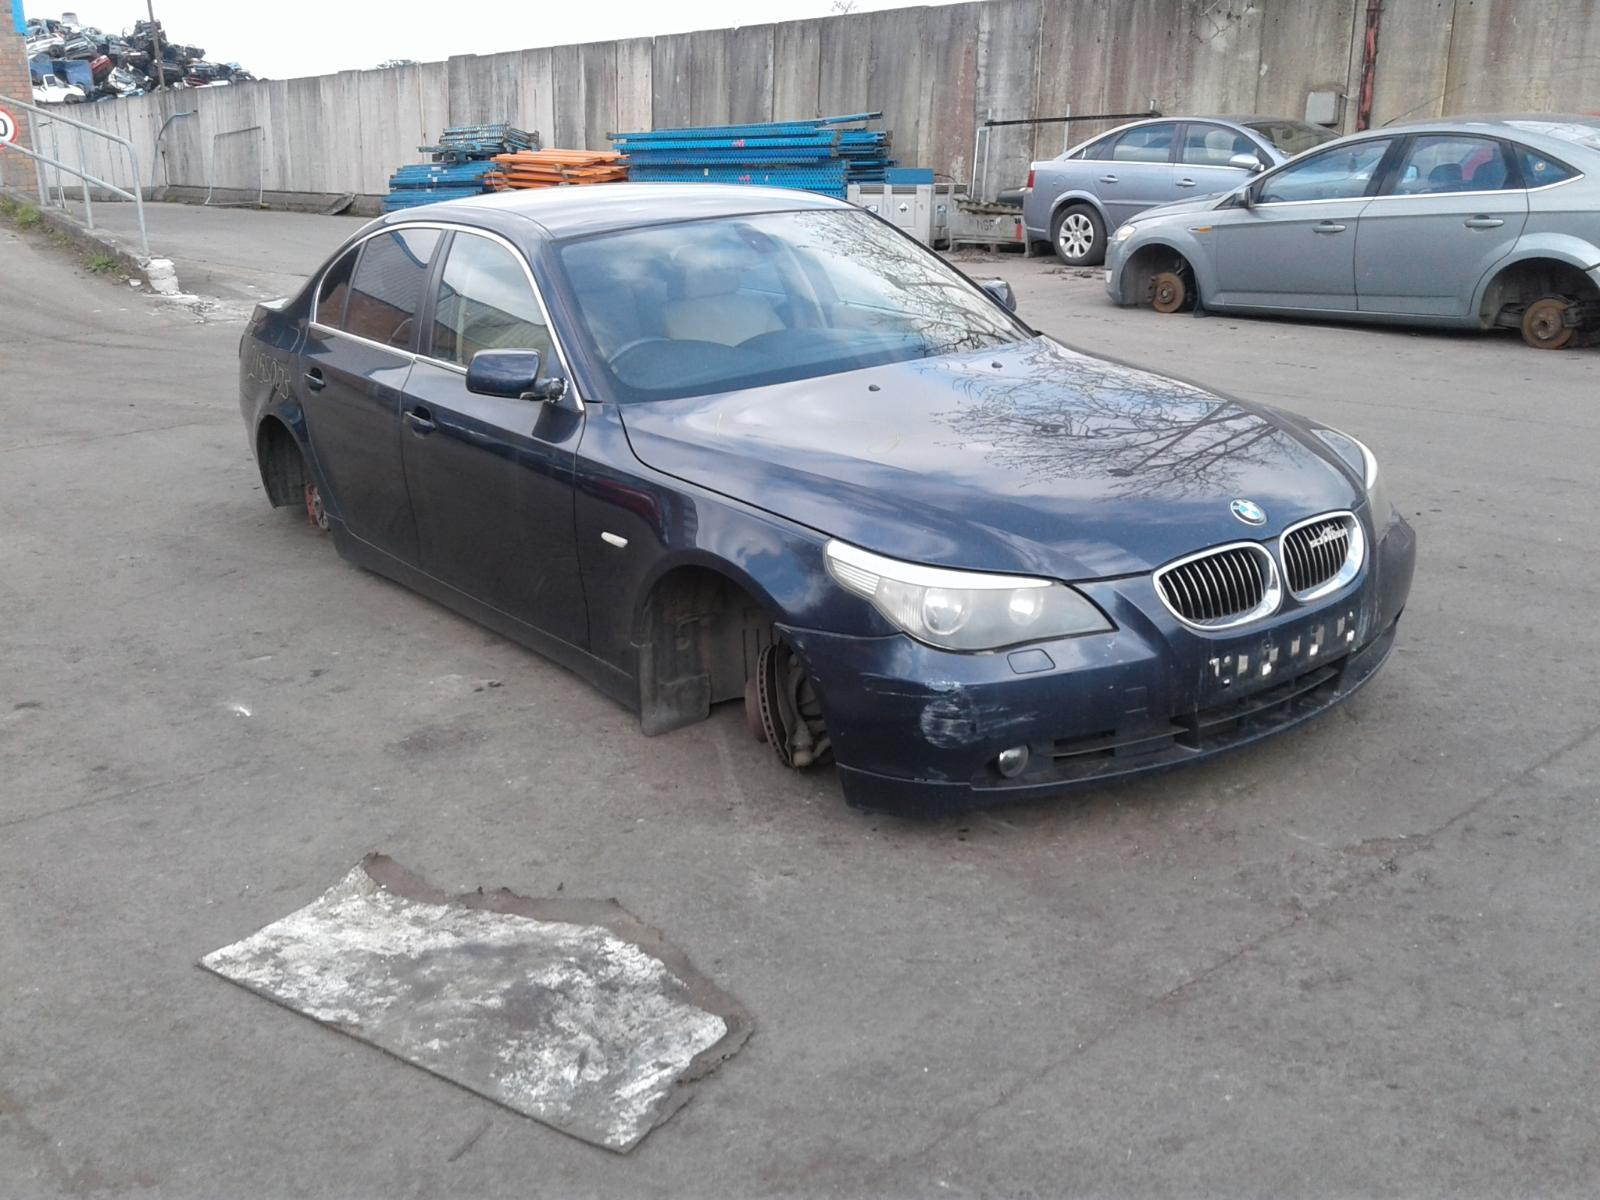 2005 BMW 5 SERIES Image